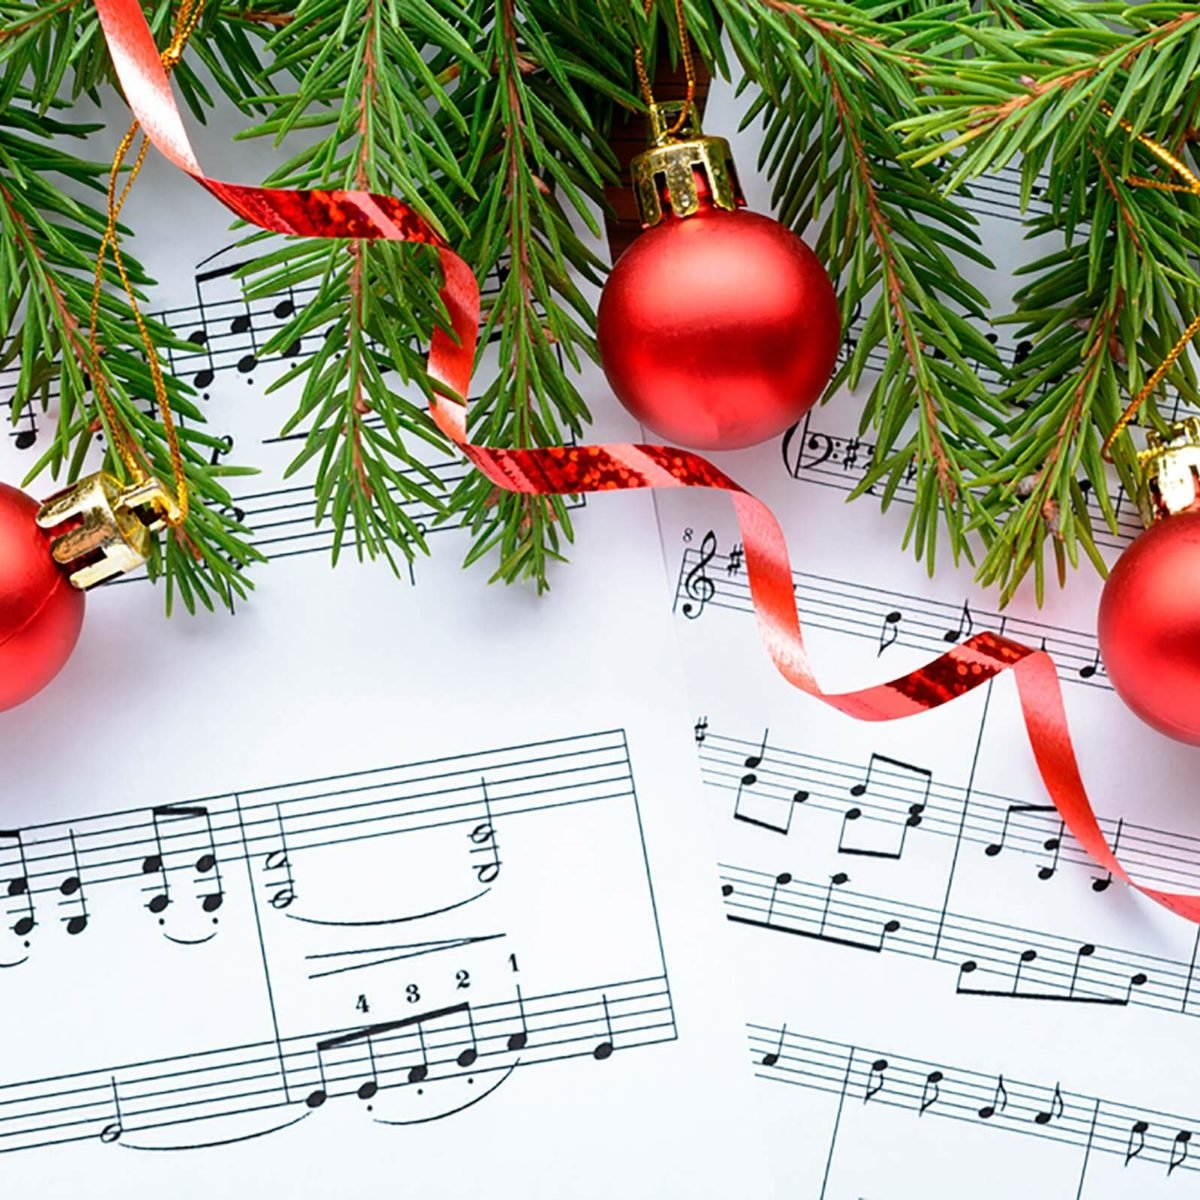 oldest-christmas-carol-not-silent-night-520117036-shutterstock-Ramil-Gibadullin-1200x1200